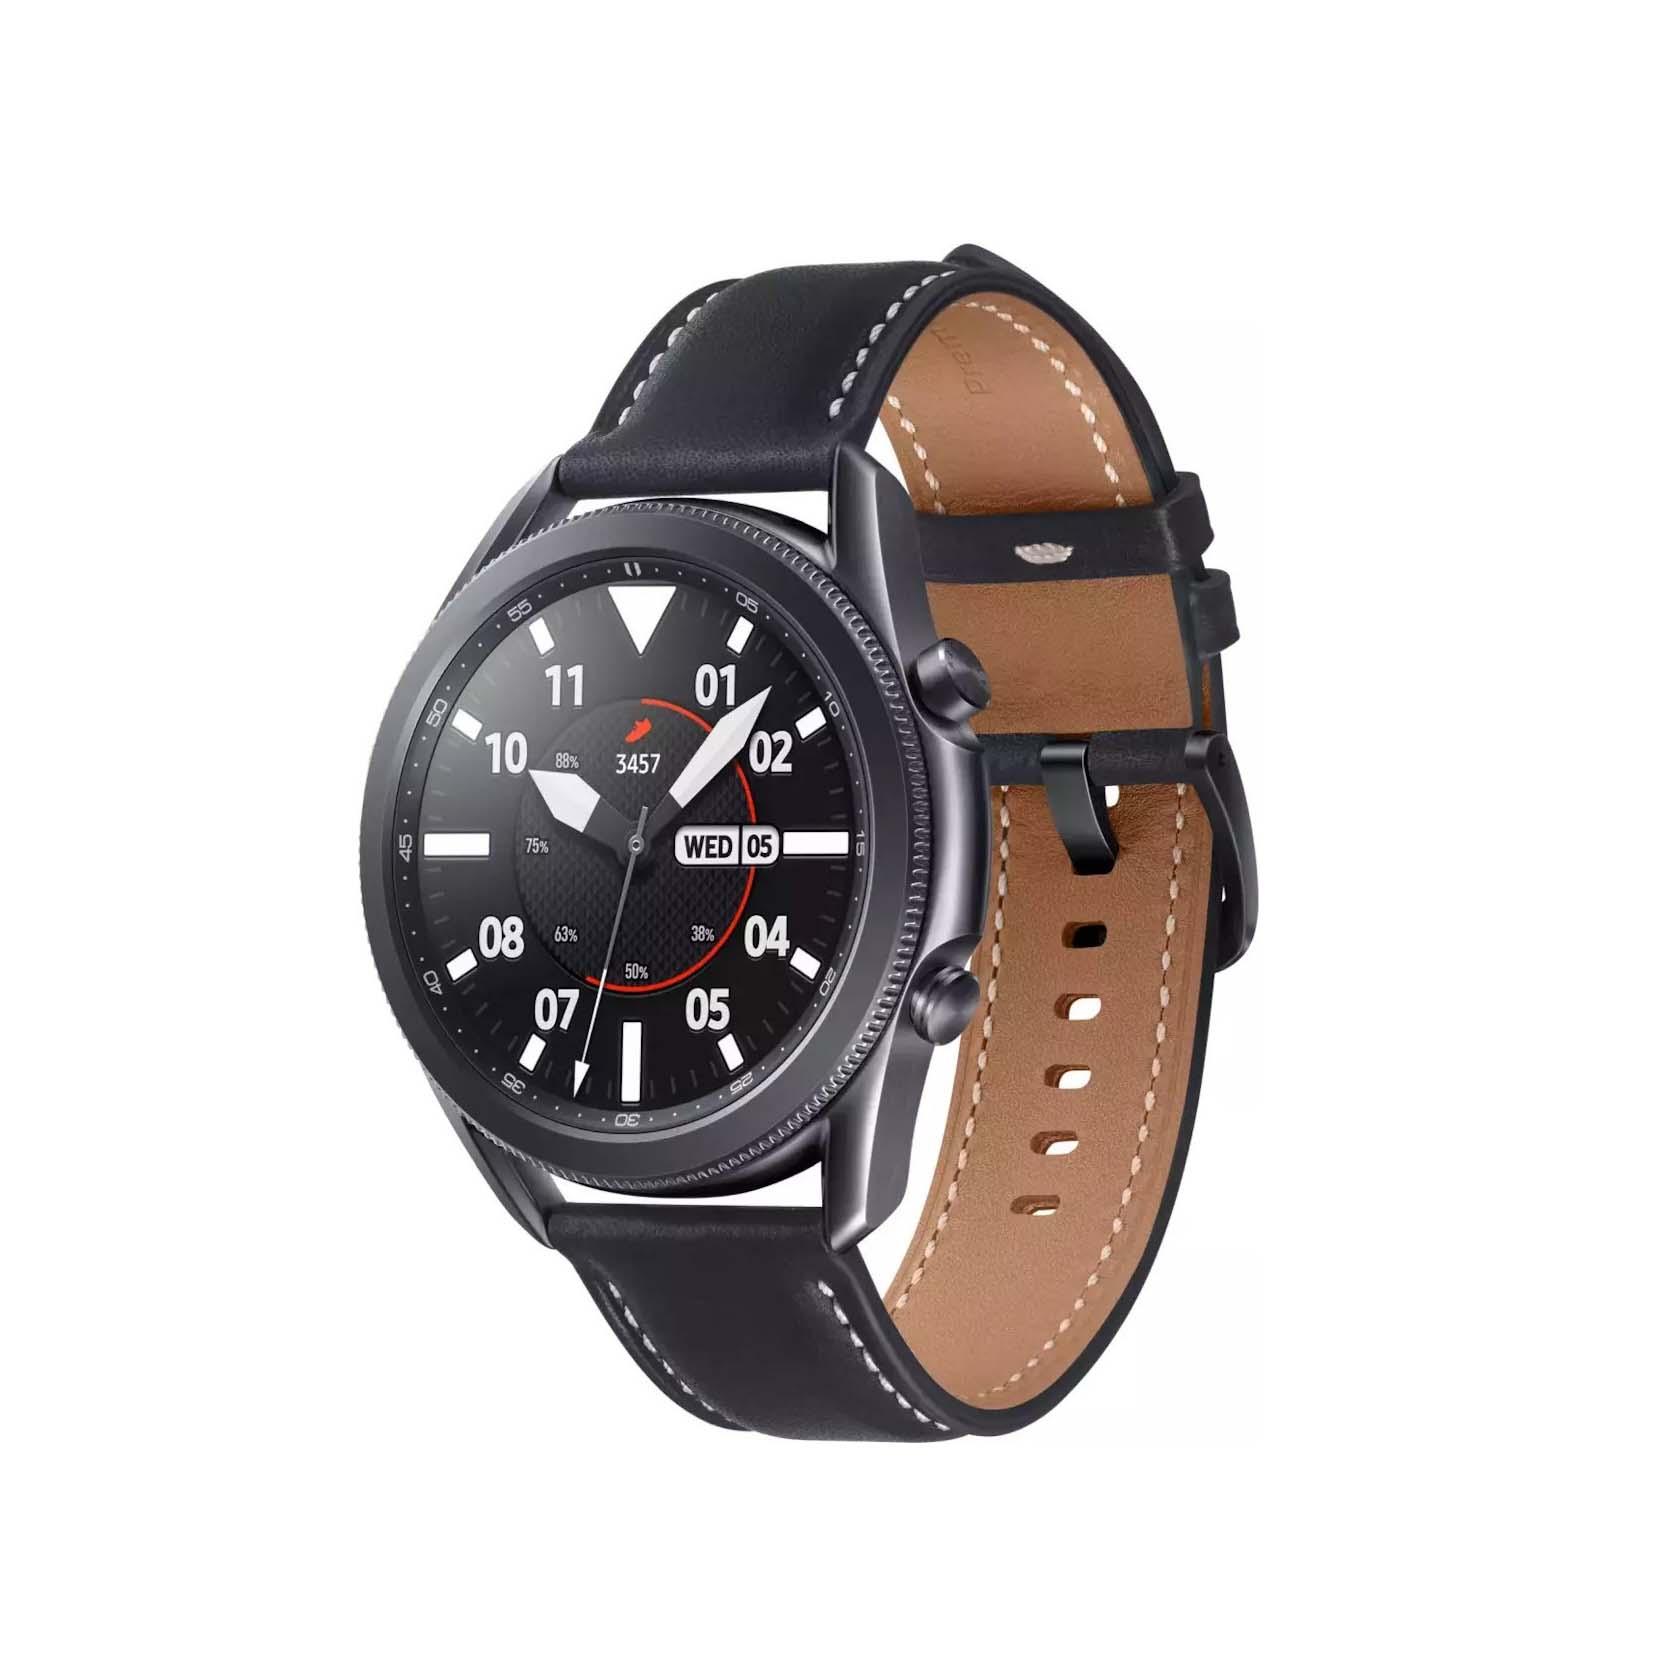 Samsung Galaxy Watch 3 45mm R840 Stainless Steel Mystic Black SM-R840 Πληρωμή έως 24 δόσεις*